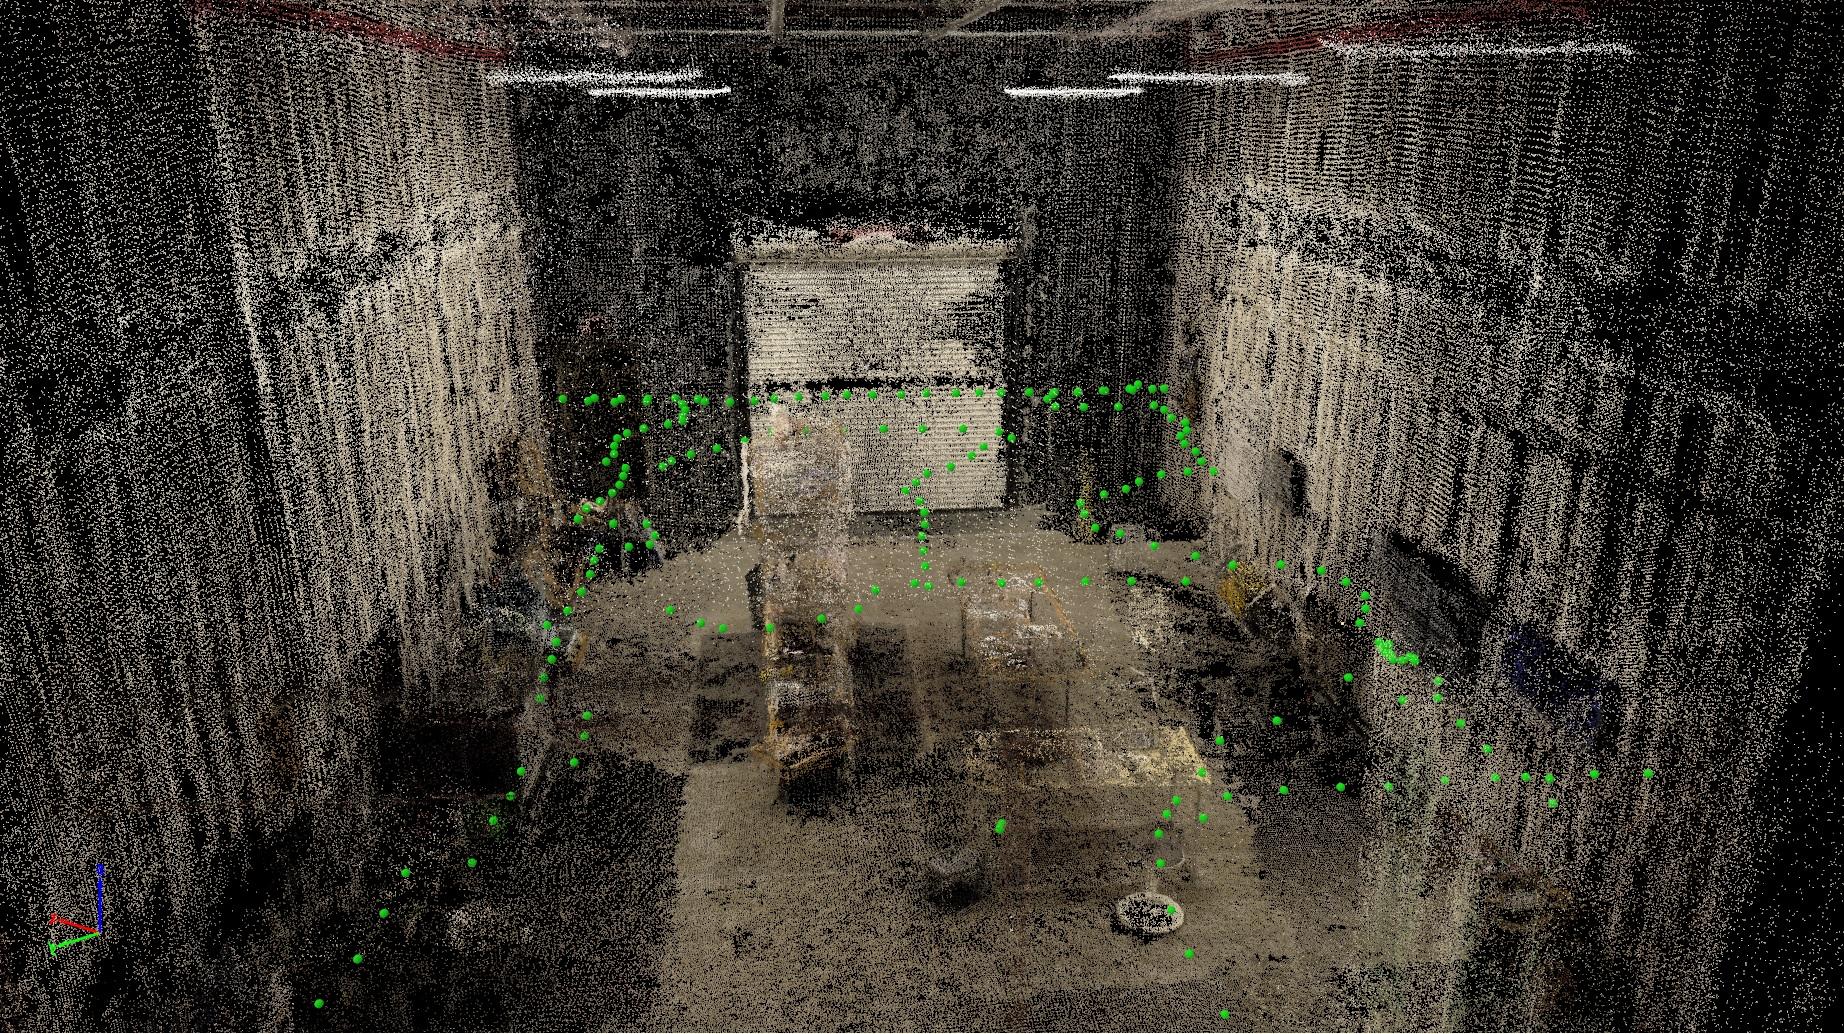 indoor-mapping-pix4d-pix4dmapper-spherical-camera-360